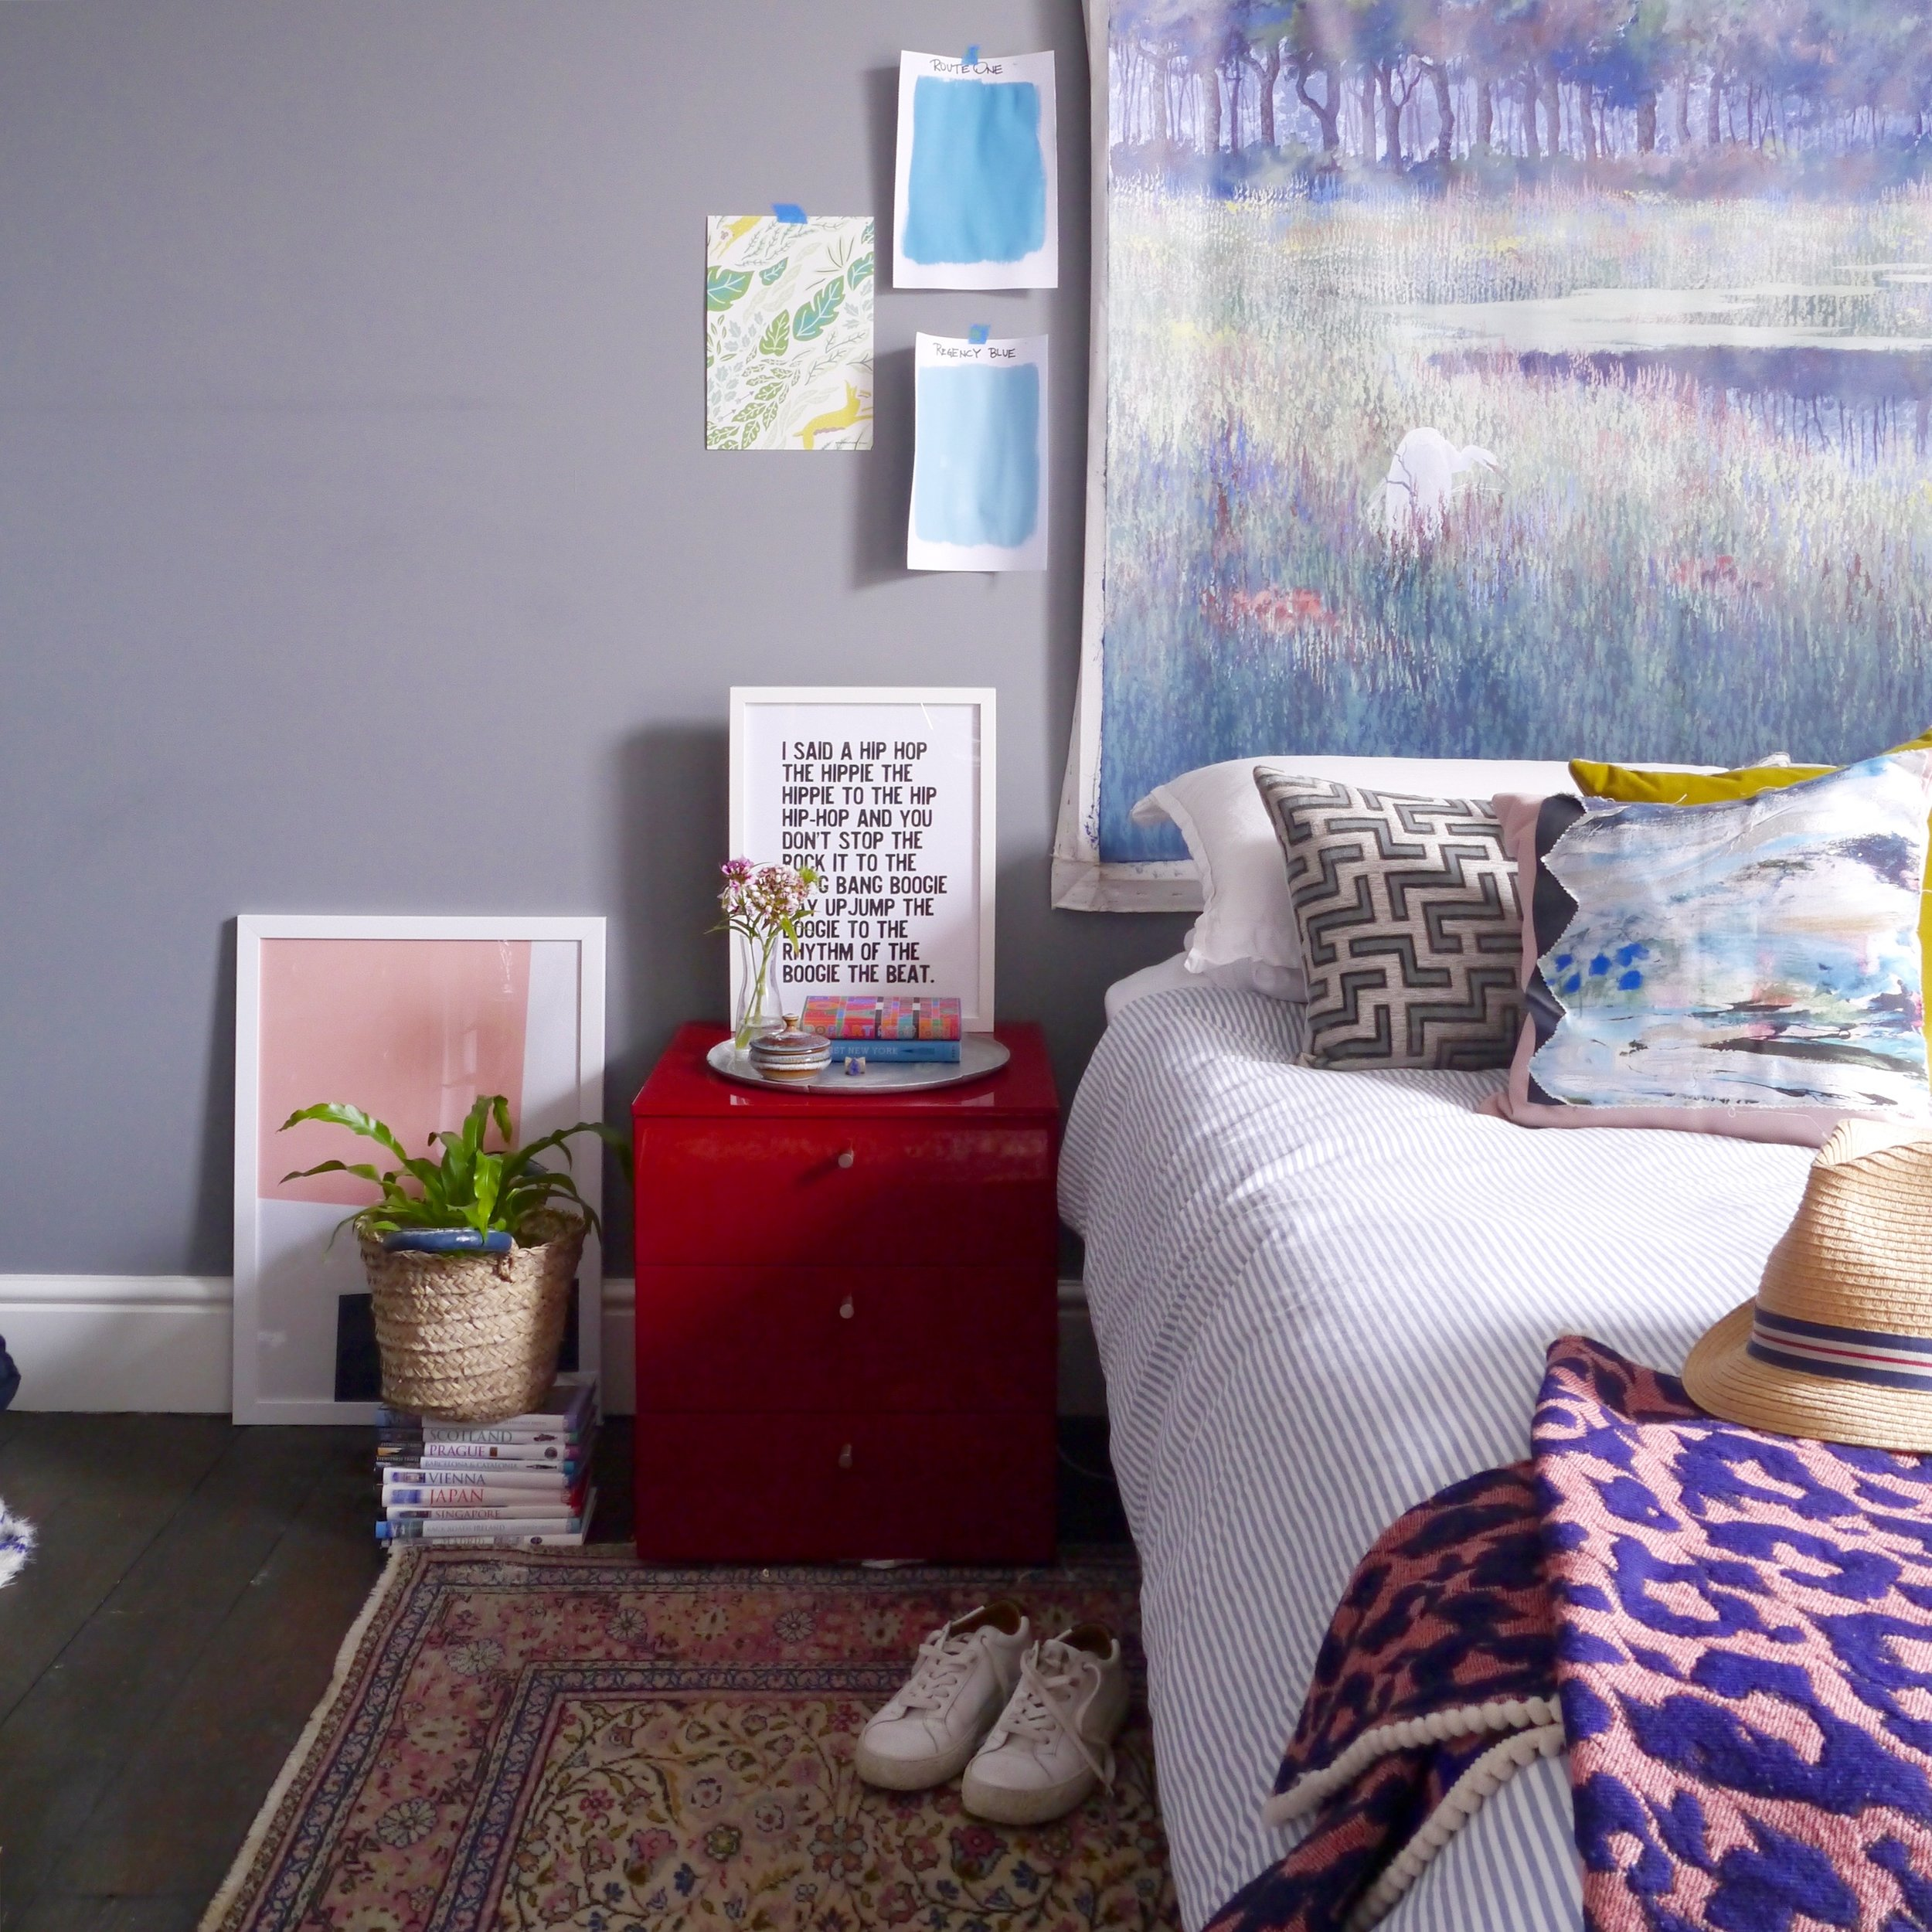 Liznylon_bedroom_revamp_ideas.jpg